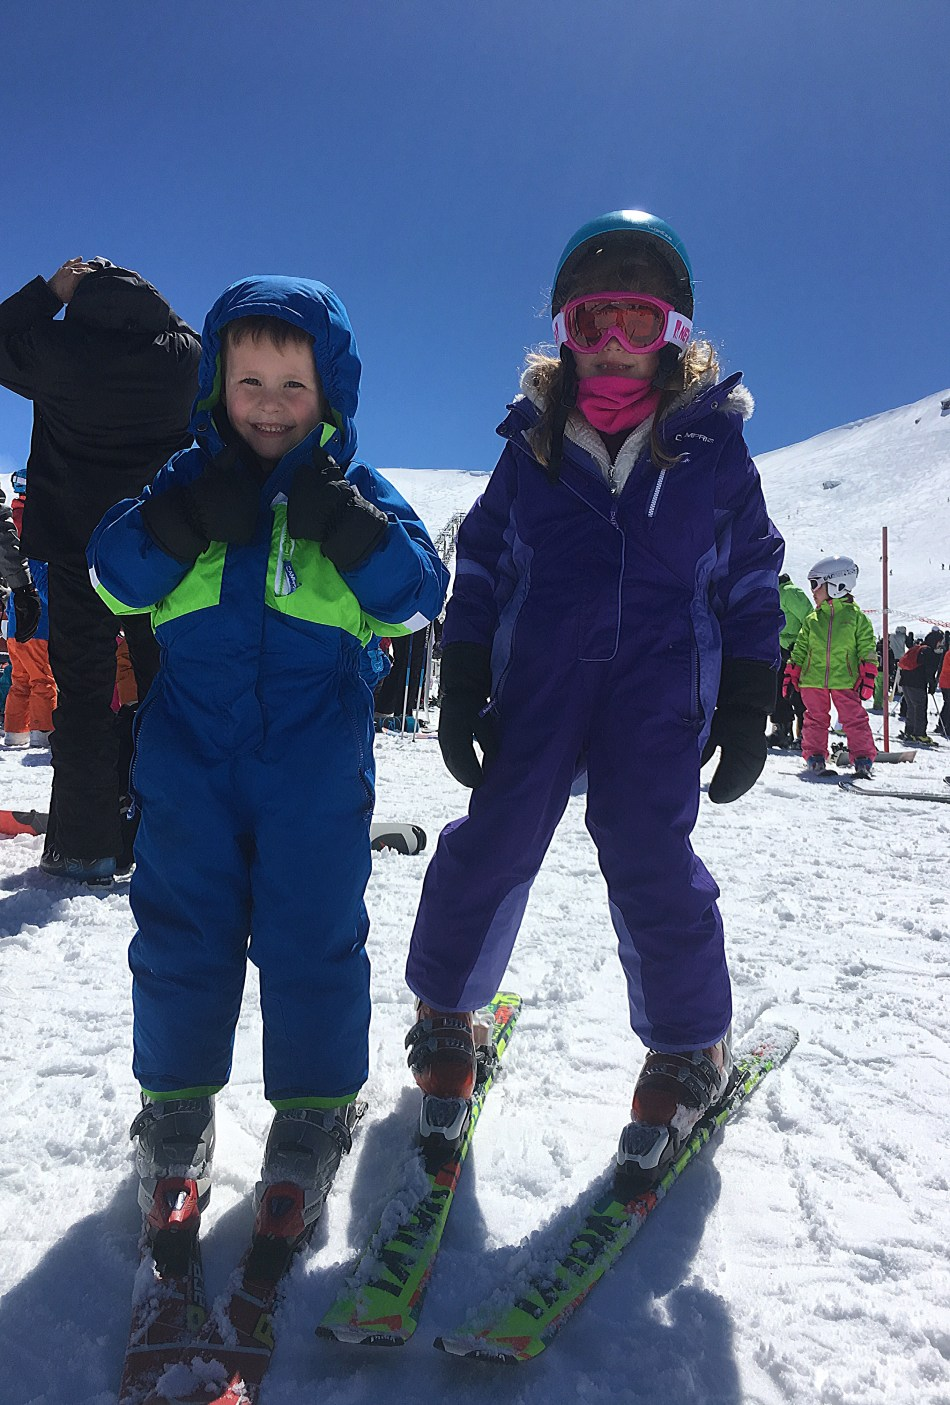 Skiing in Sierra Nevada, hiding the photo travel fails